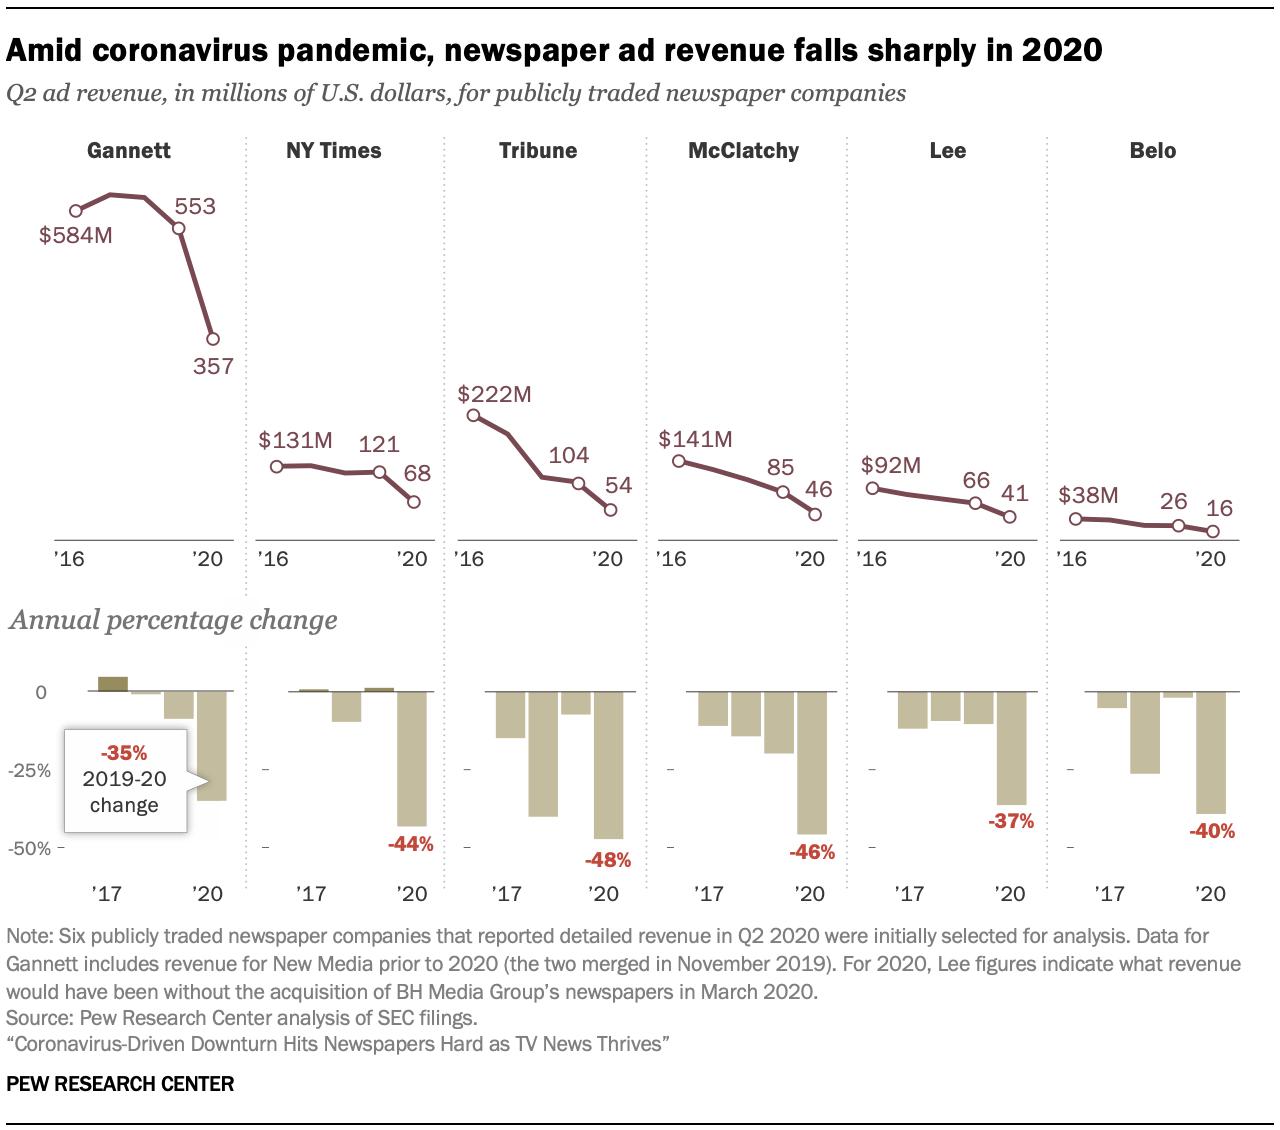 Amid coronavirus pandemic, newspaper ad revenue falls sharply in 2020